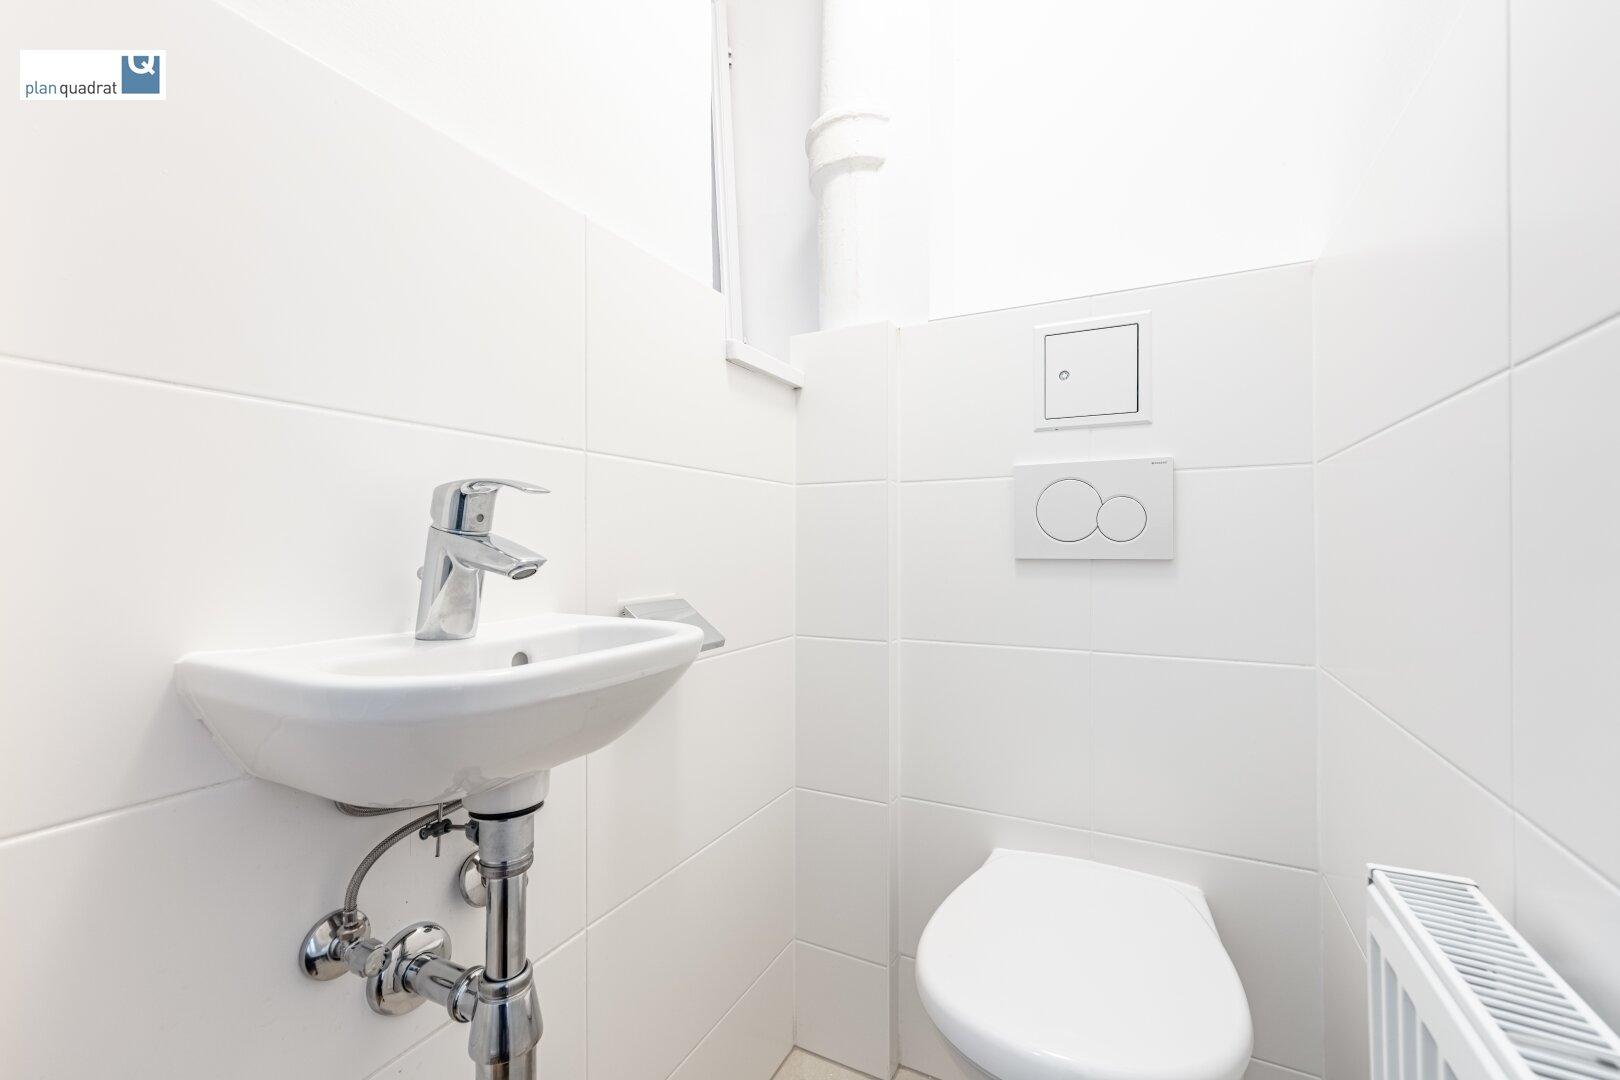 separate Toilette (linke Toilette)